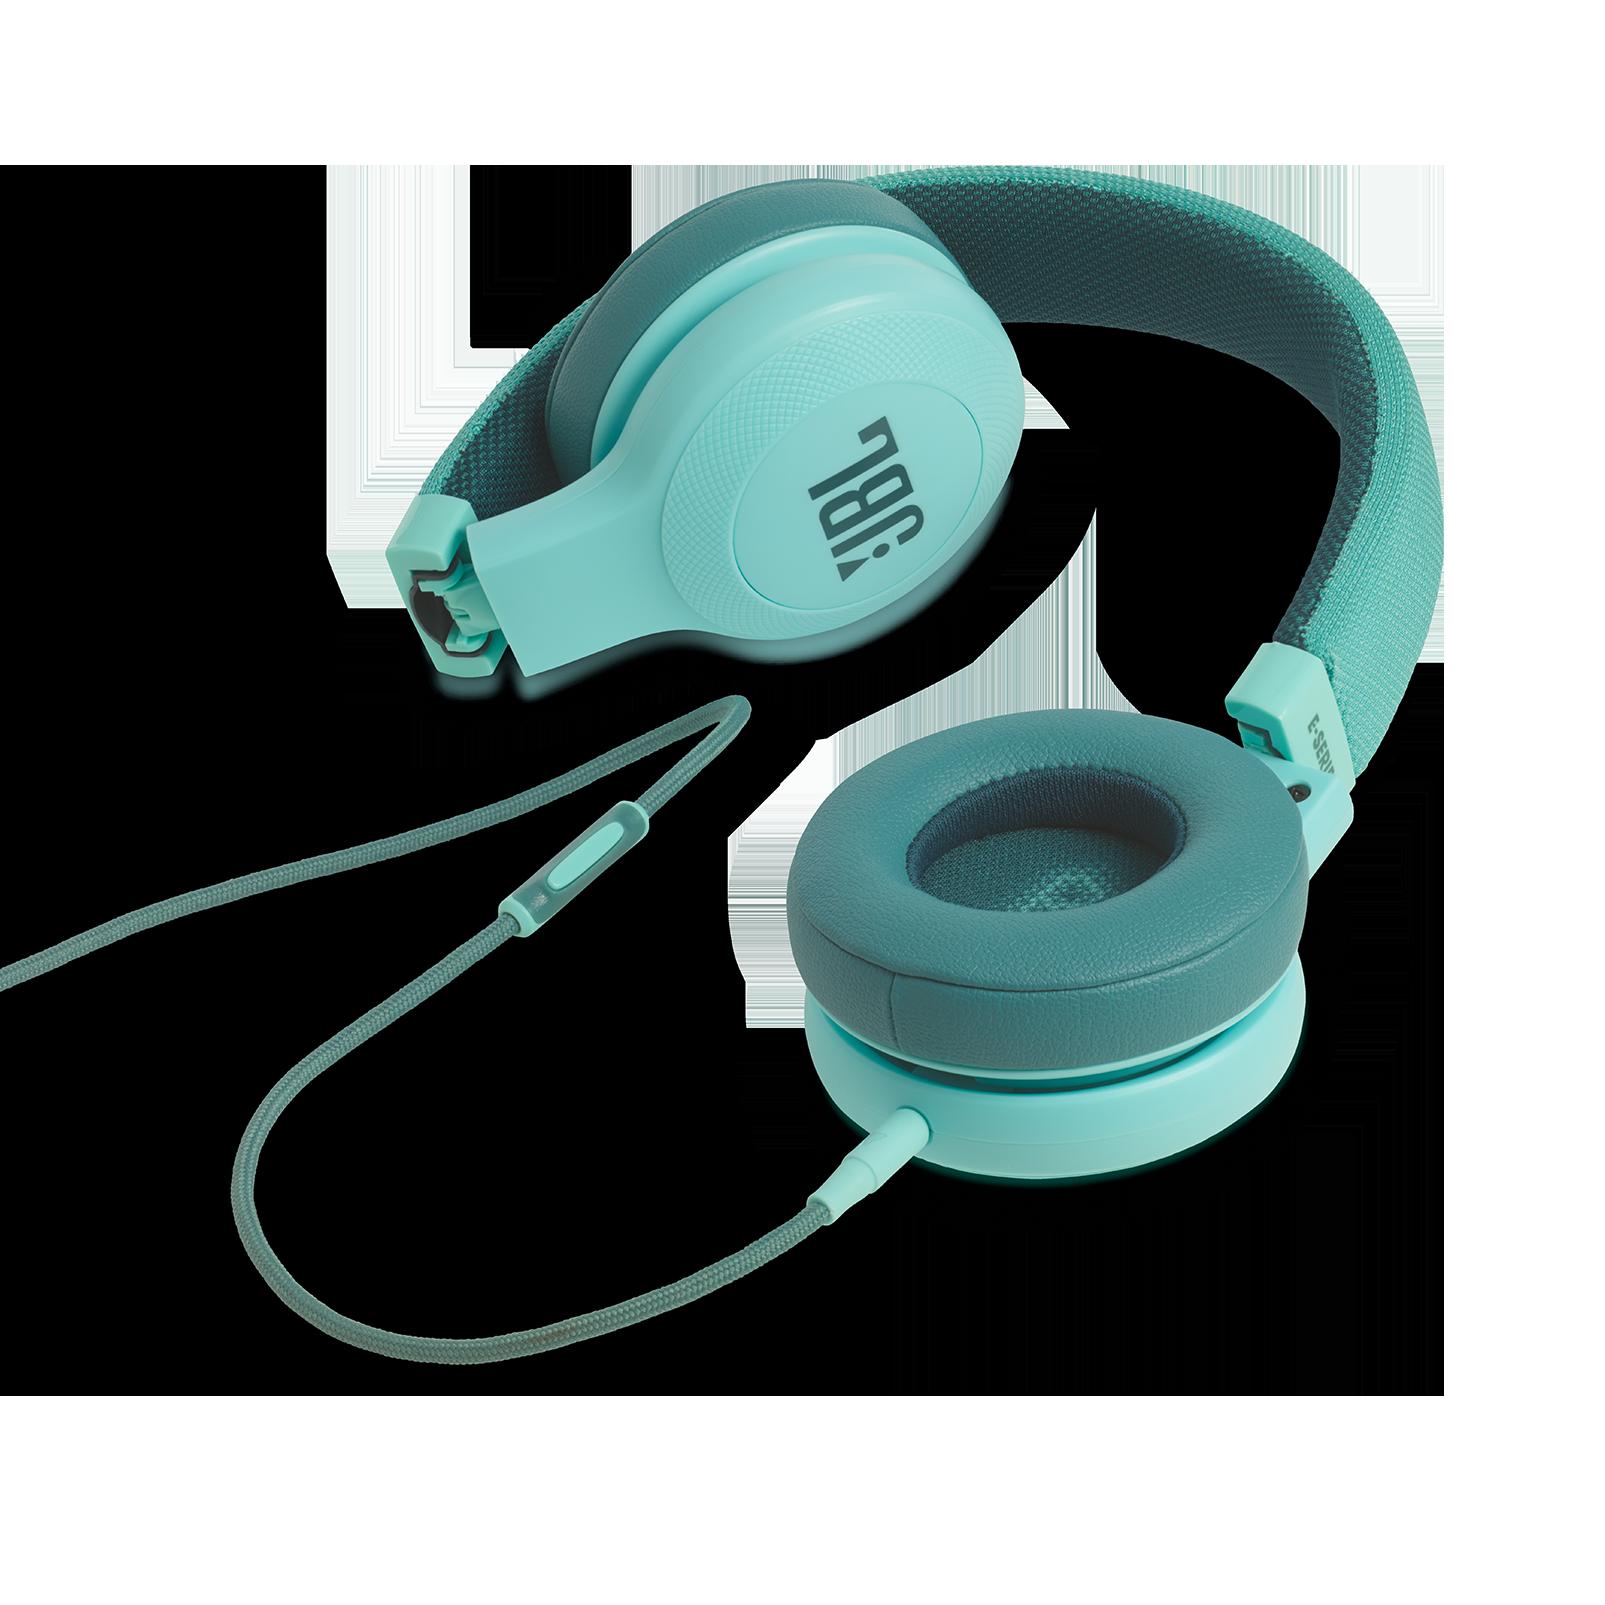 E35 - Teal - On-ear headphones - Detailshot 3